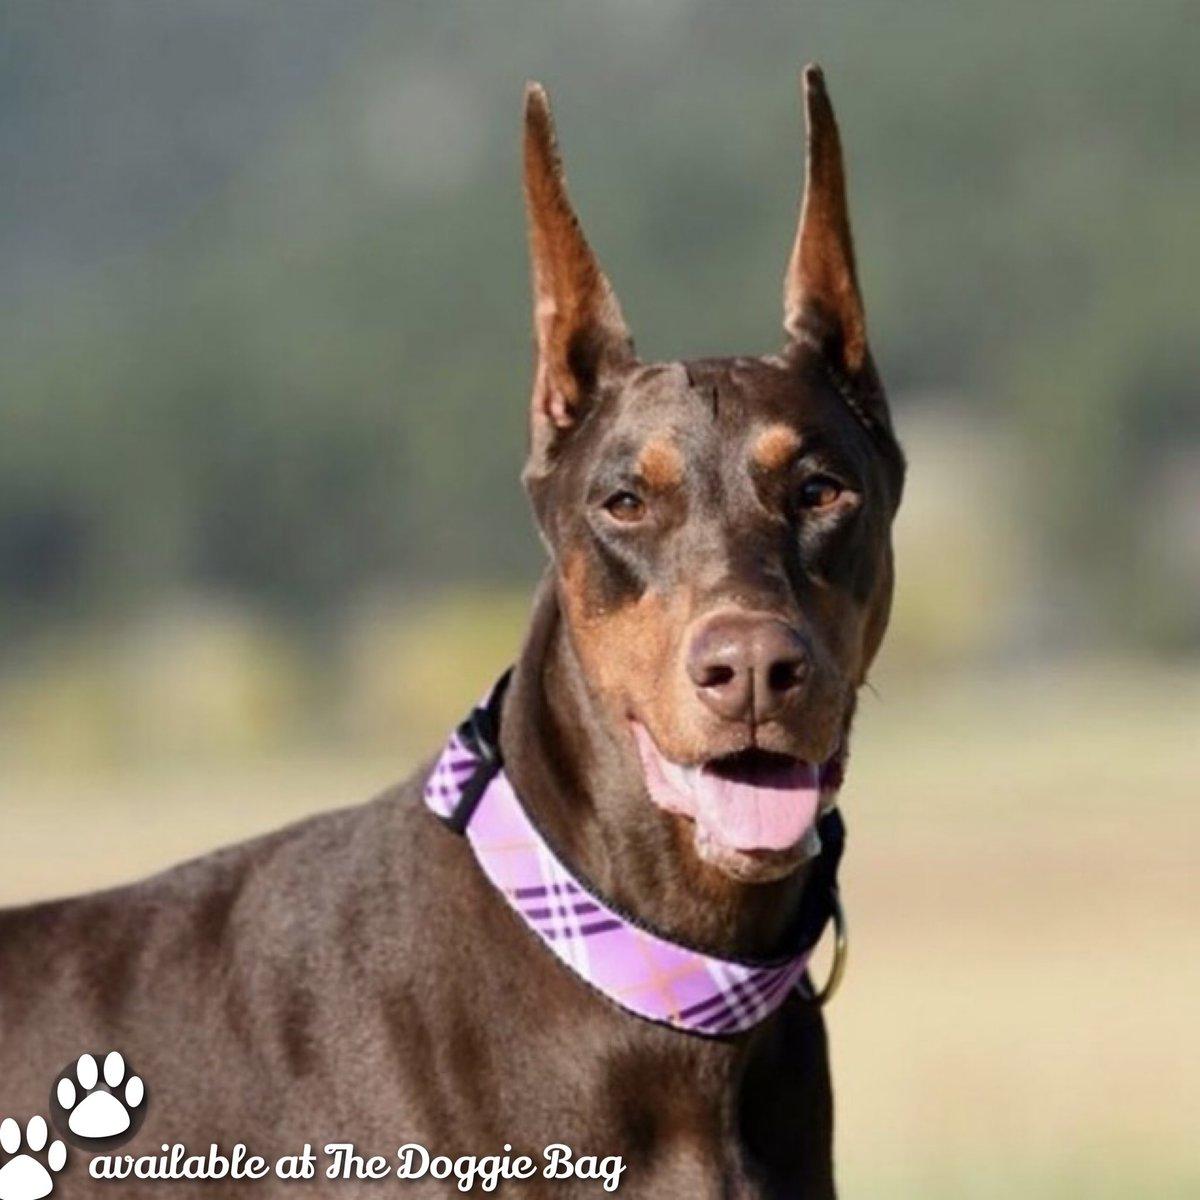 She's looking lovely in the Lavender Lattice #Collar from #UpCountryDog. 💜  Available at The Doggie Bag. 🐾❤️  📸 @moosesmum   #collars #dogcollar #dogstyle #dogfashion #doglife #doberman #dobermanpinscher #thedoggiebag #petboutique #shoplakeland #lakelandflorida #lakelandfl